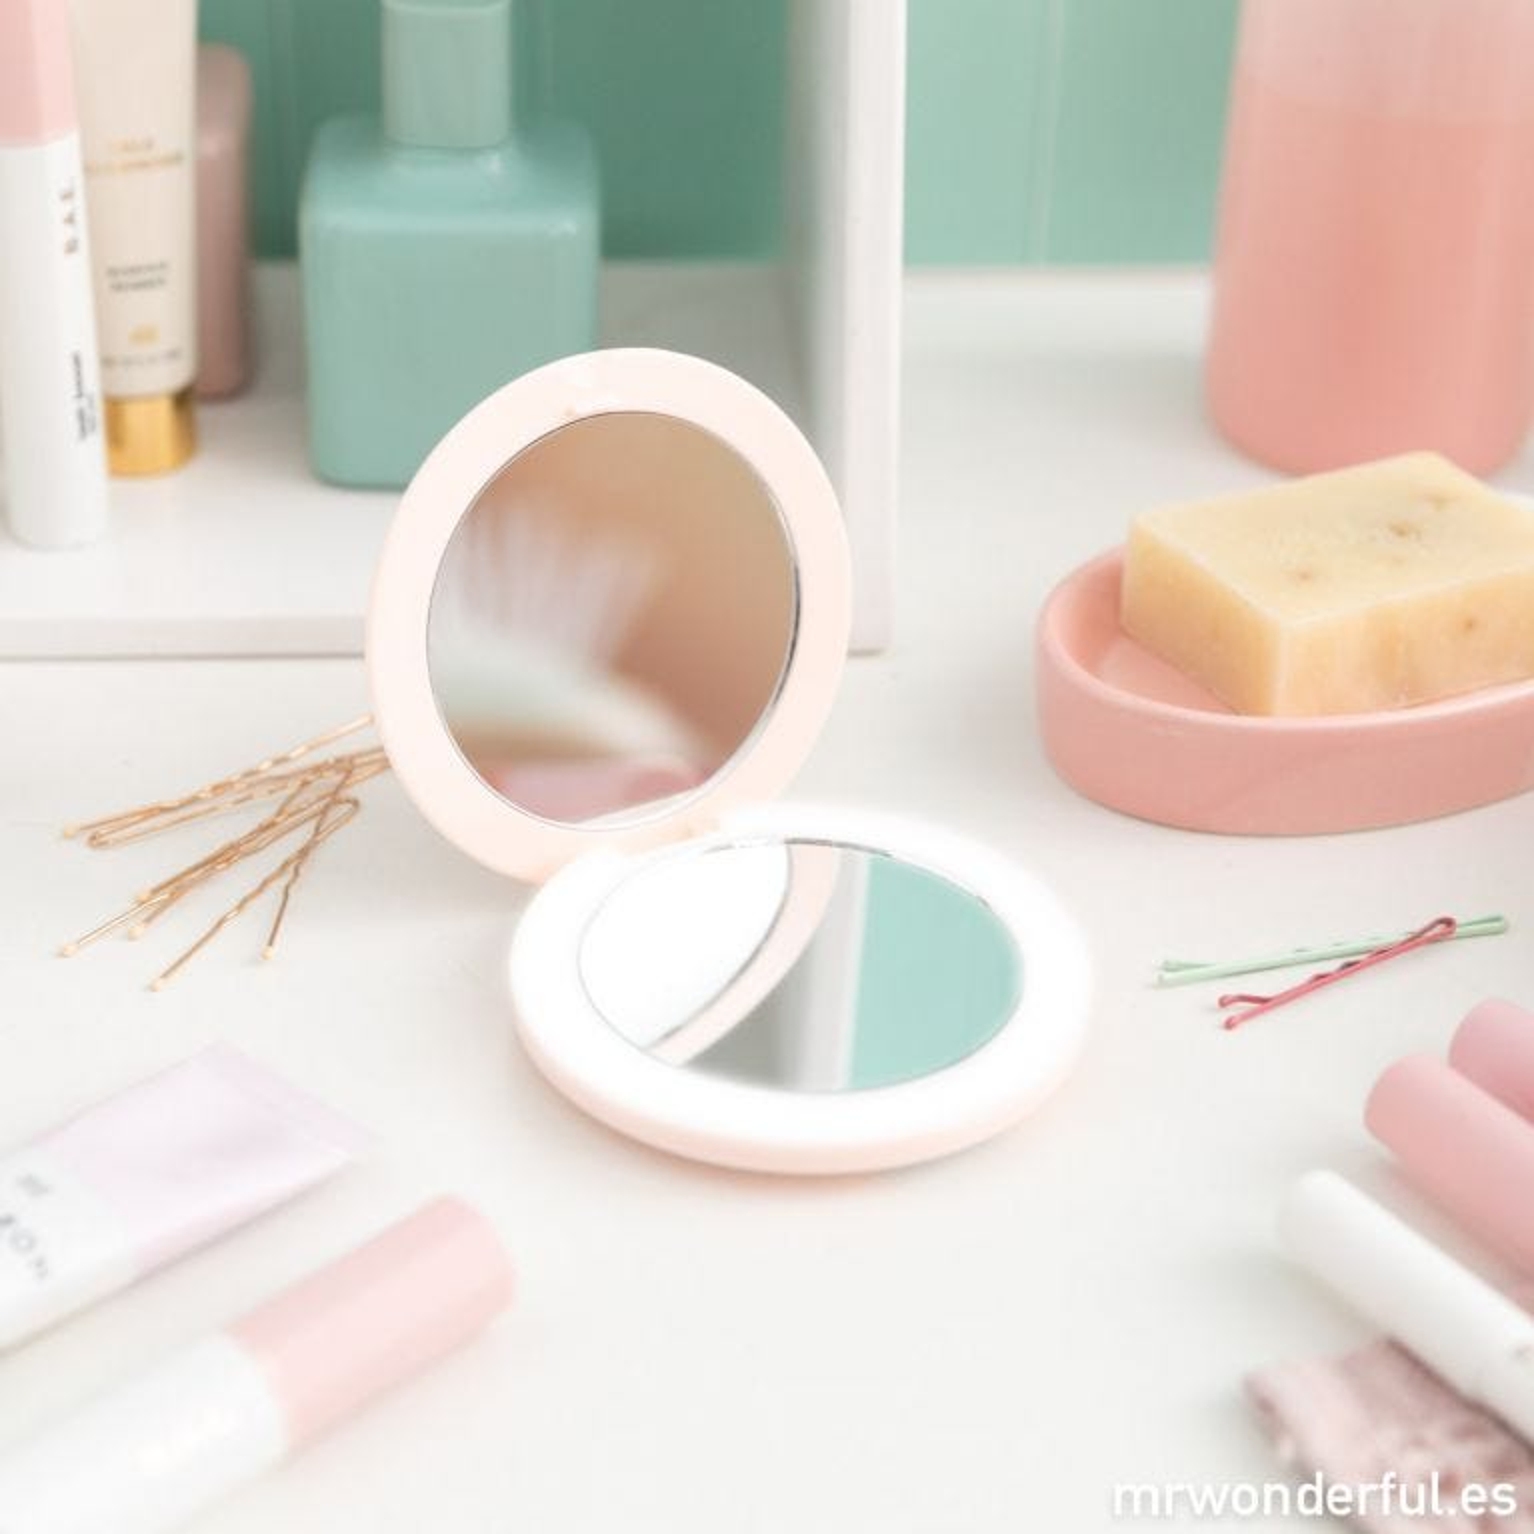 Espejo de bolso rosa - ¡Olé yo y mi cara bonita!